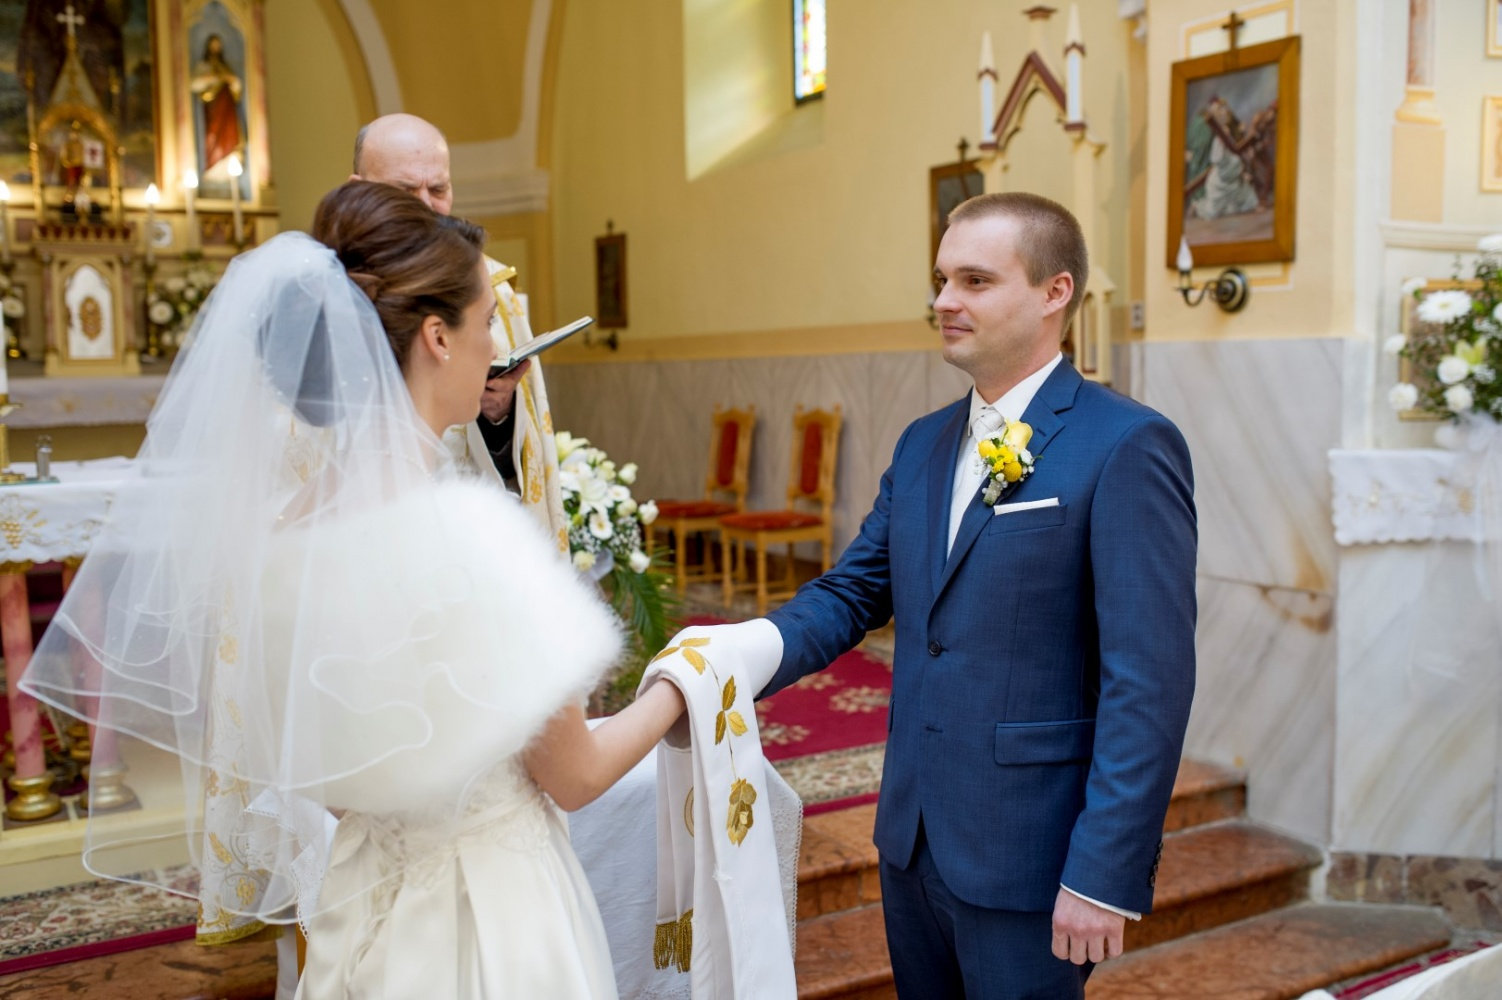 http://www.fotoz.sk/images/gallery-23/normal/svadba-_sv_petrus-vini_048.jpg